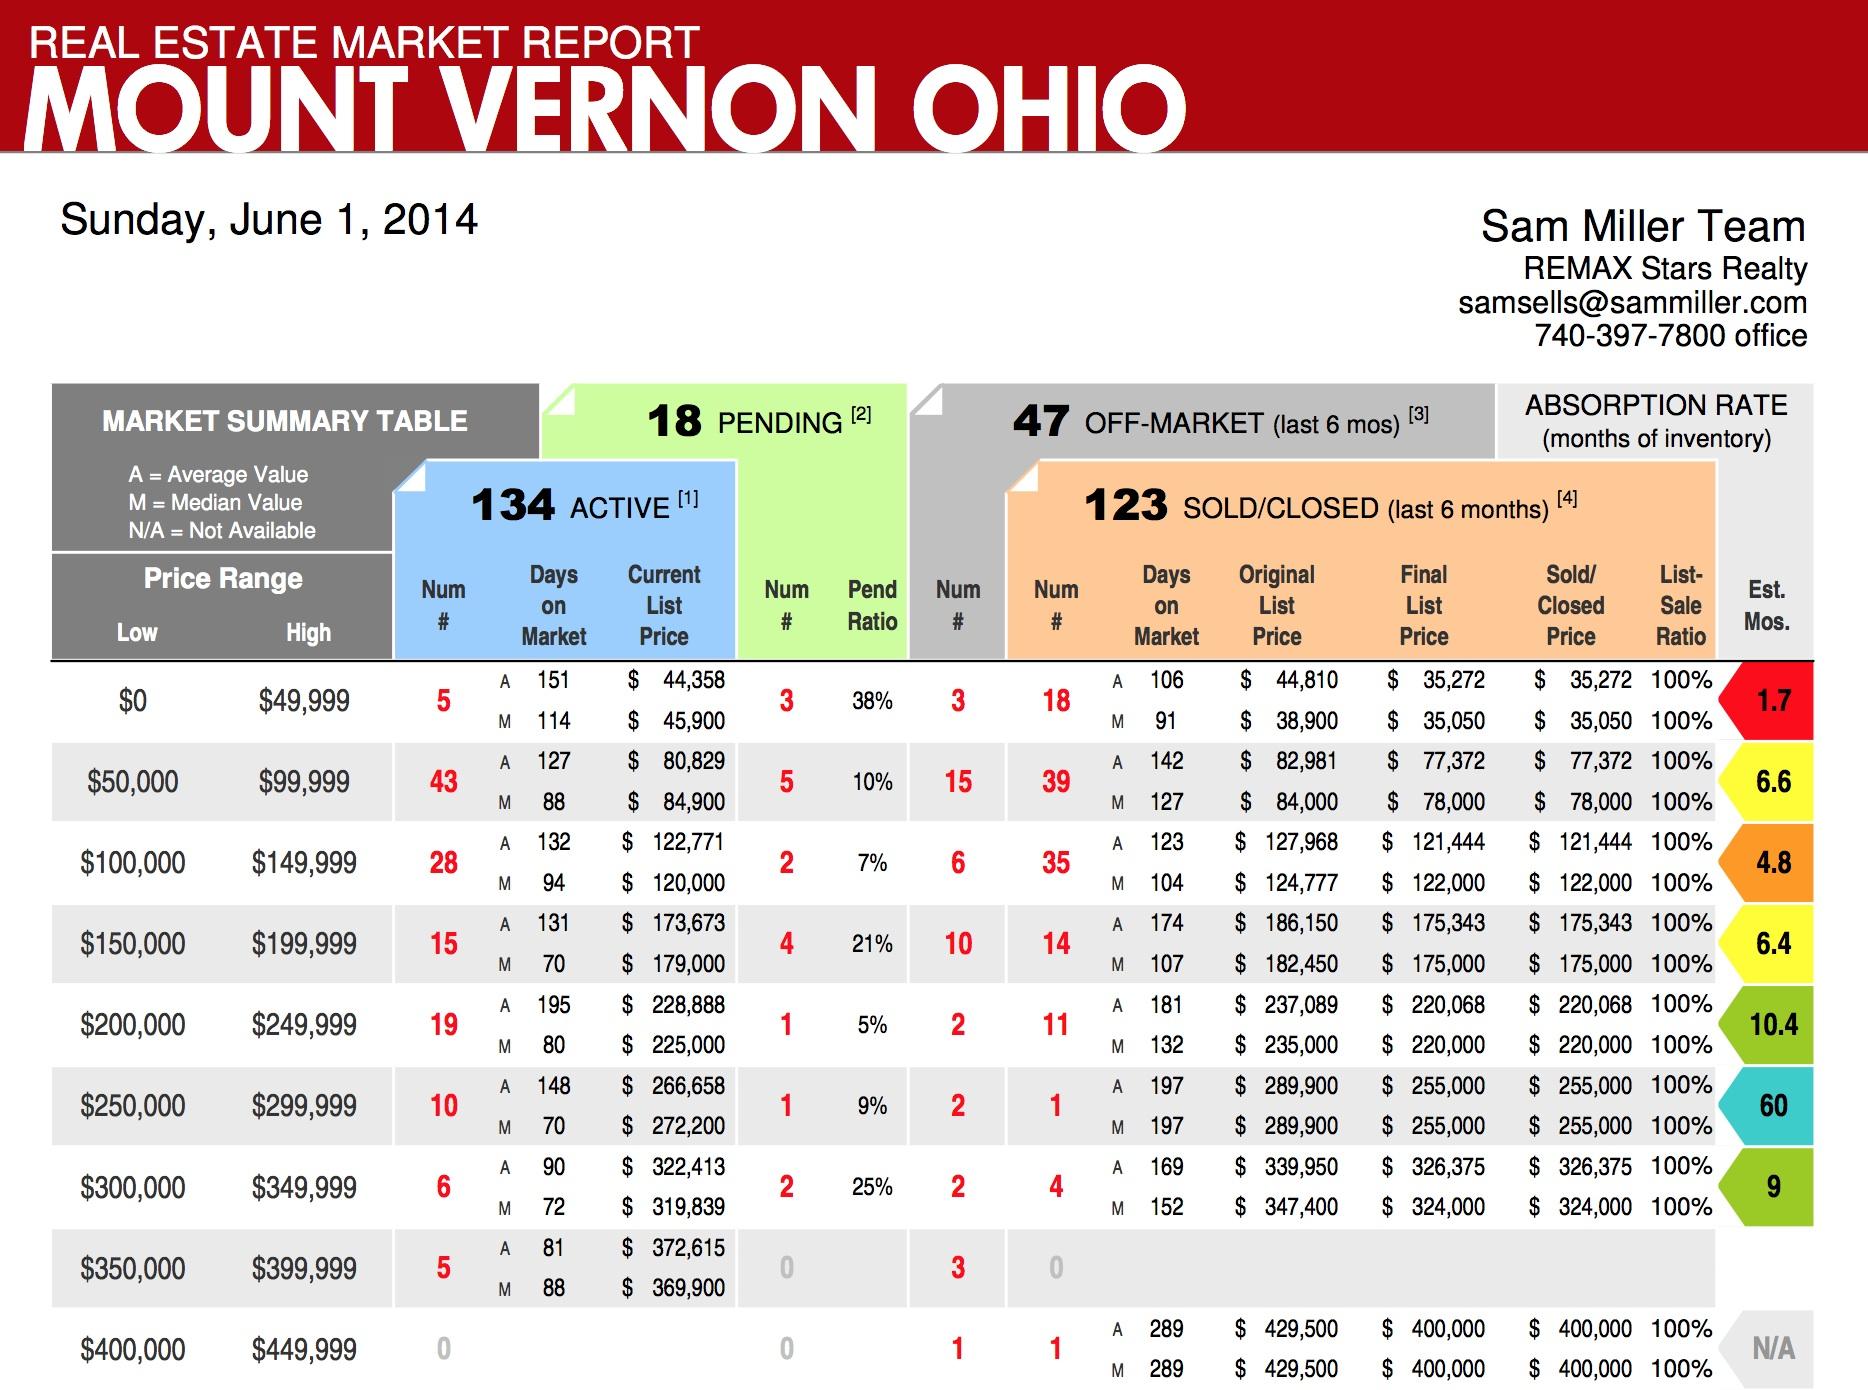 Mount Vernon Ohio Home Sales Report by Sam Miller